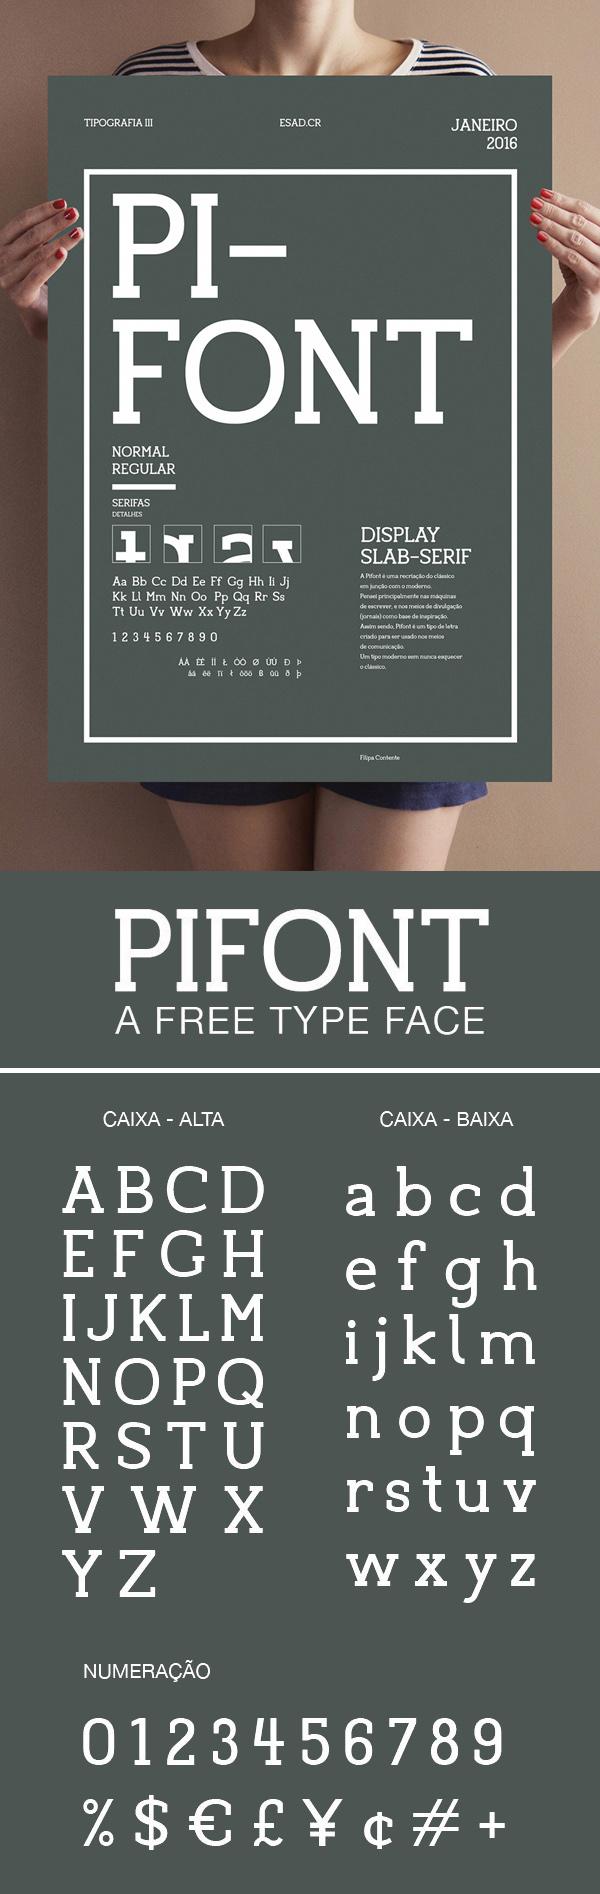 09 Pifont